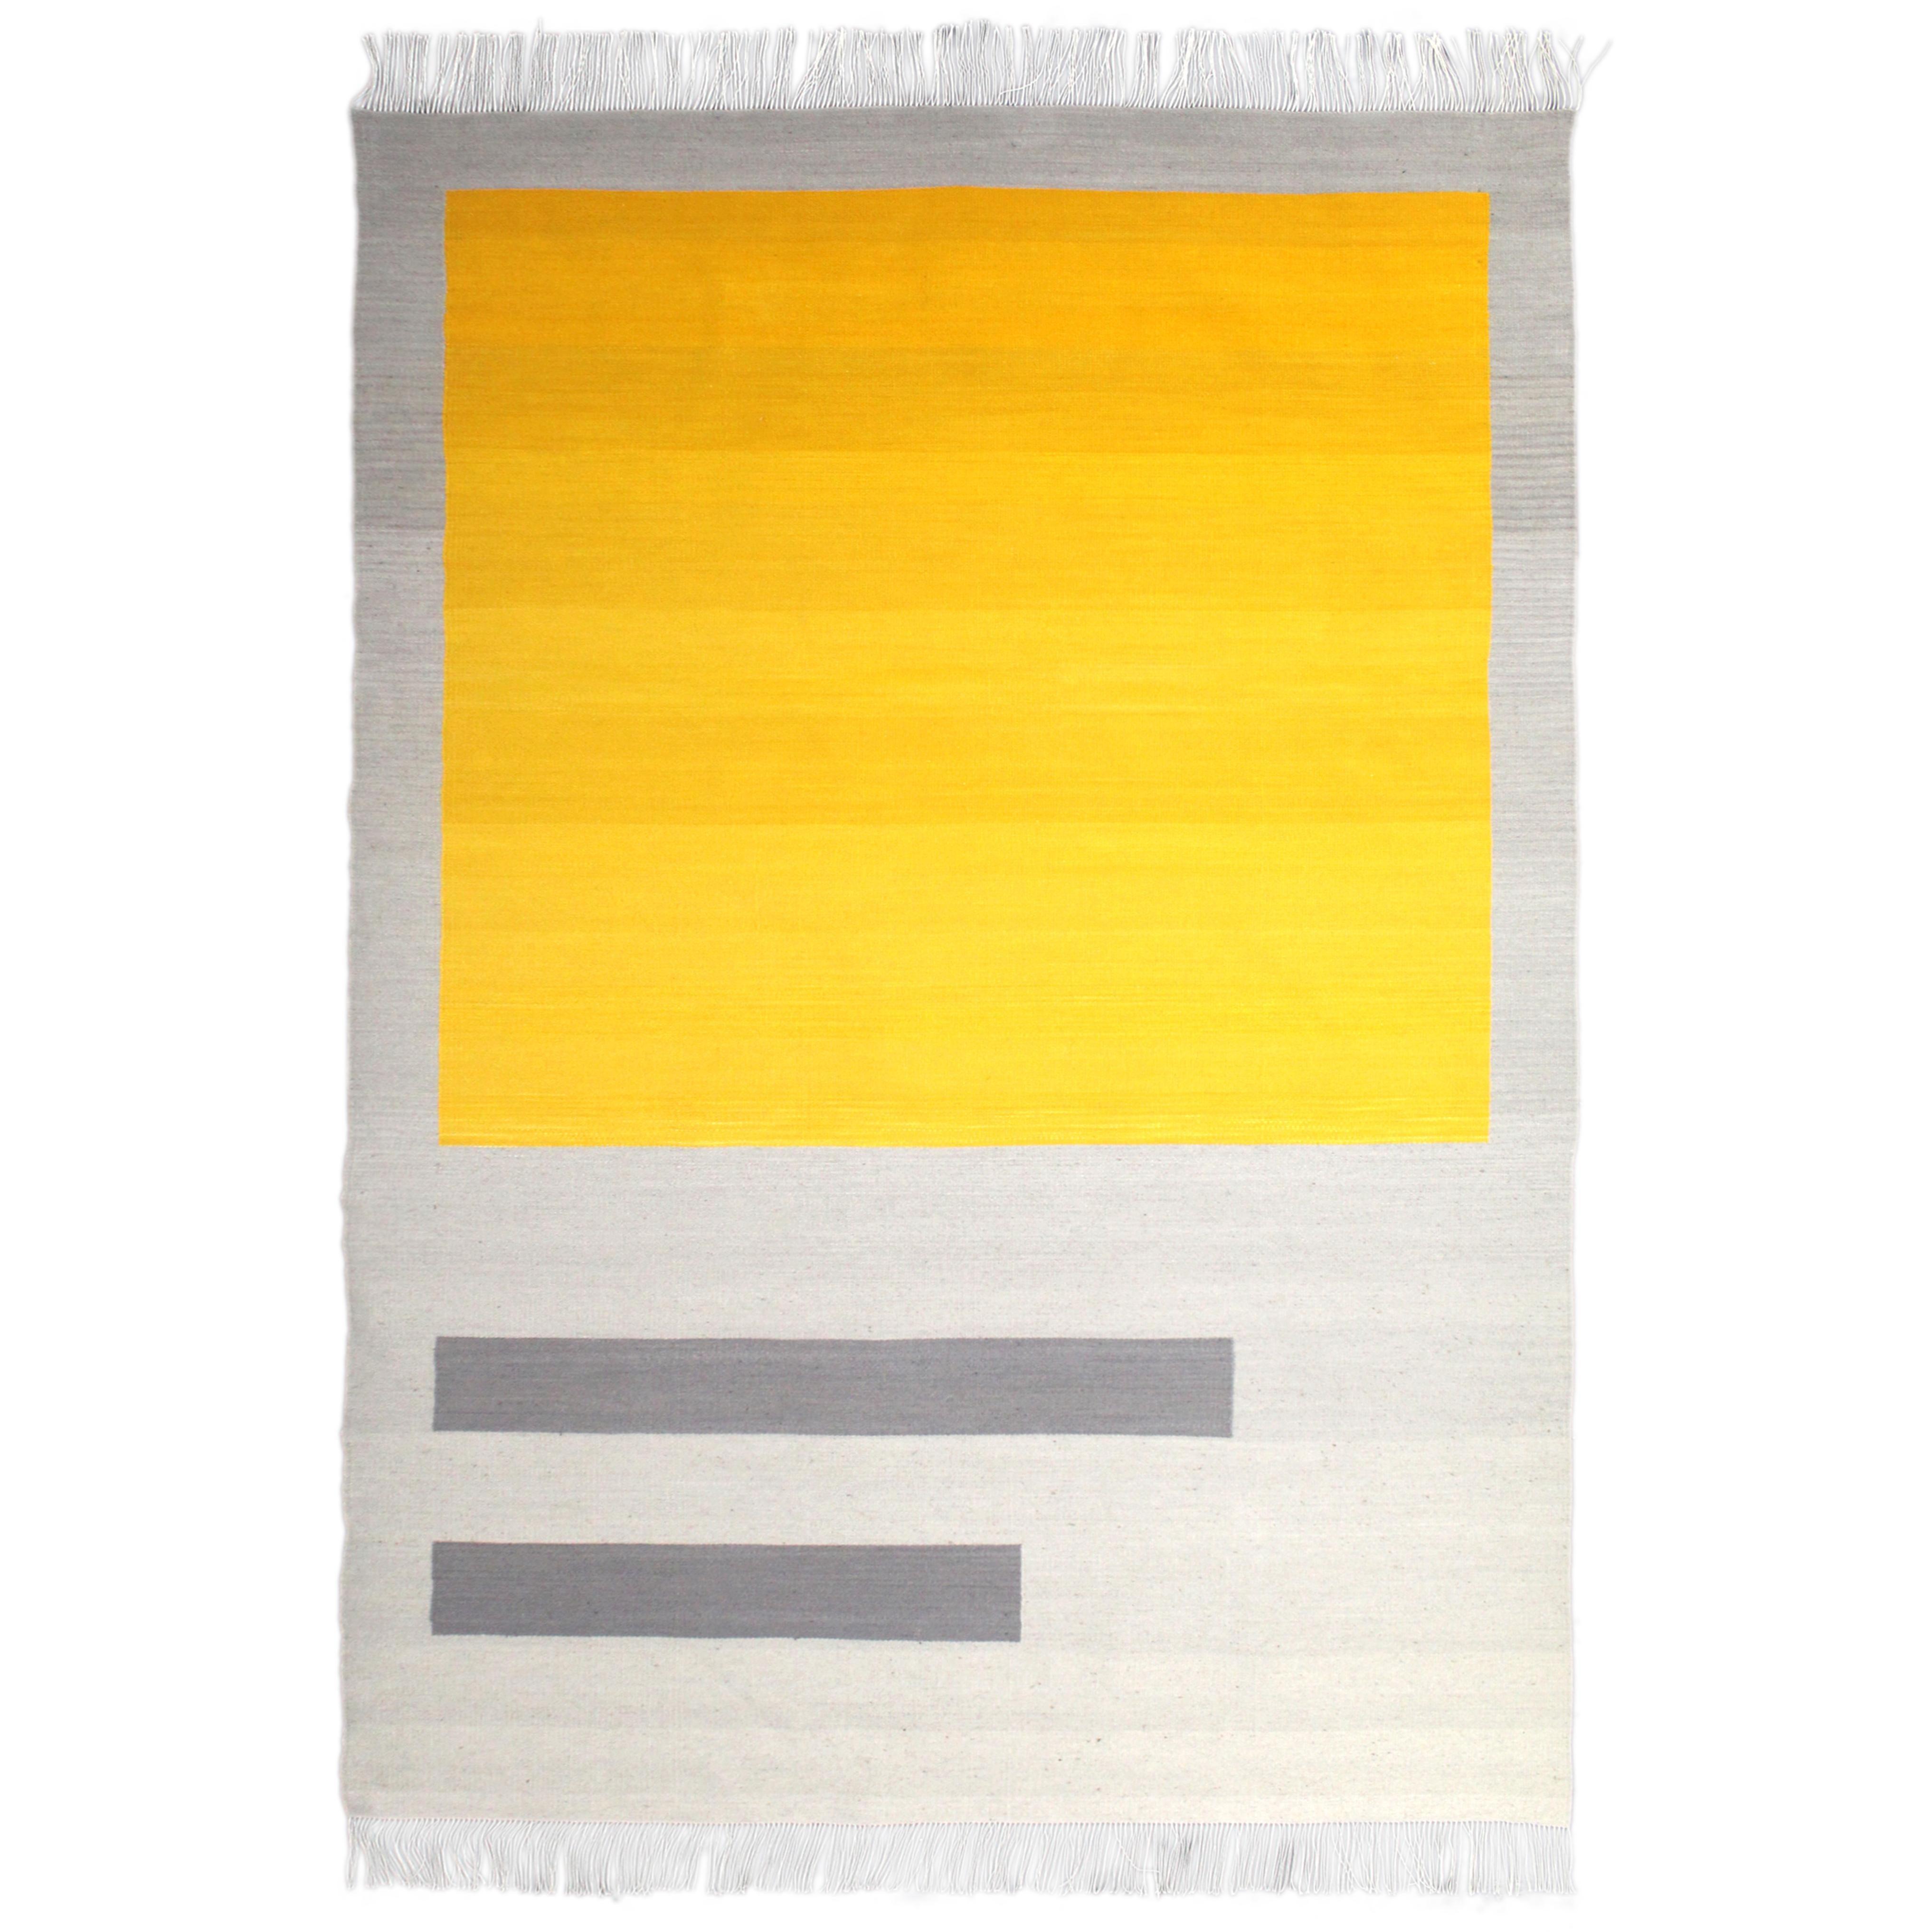 Bespoke Yellow and Grey Wool Handwoven Rug or Kilim, Natural Dye